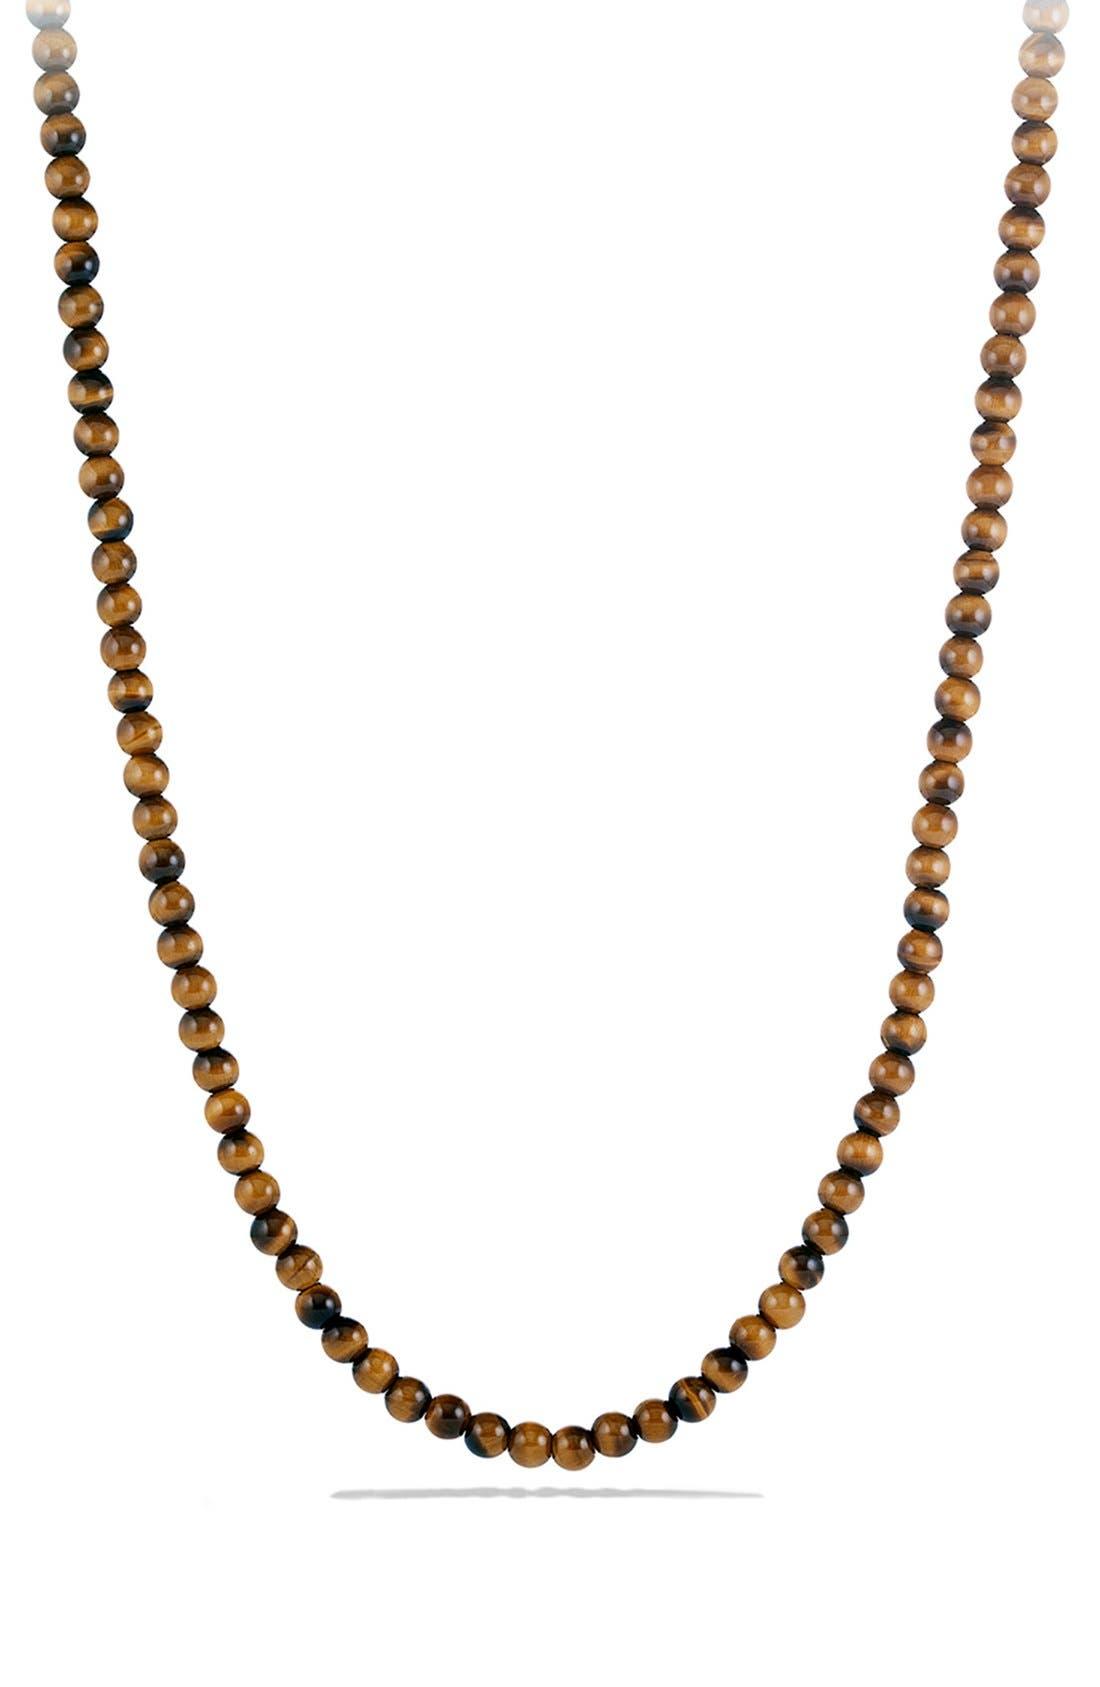 Main Image - David Yurman 'Spiritual Beads' Necklace with Stone